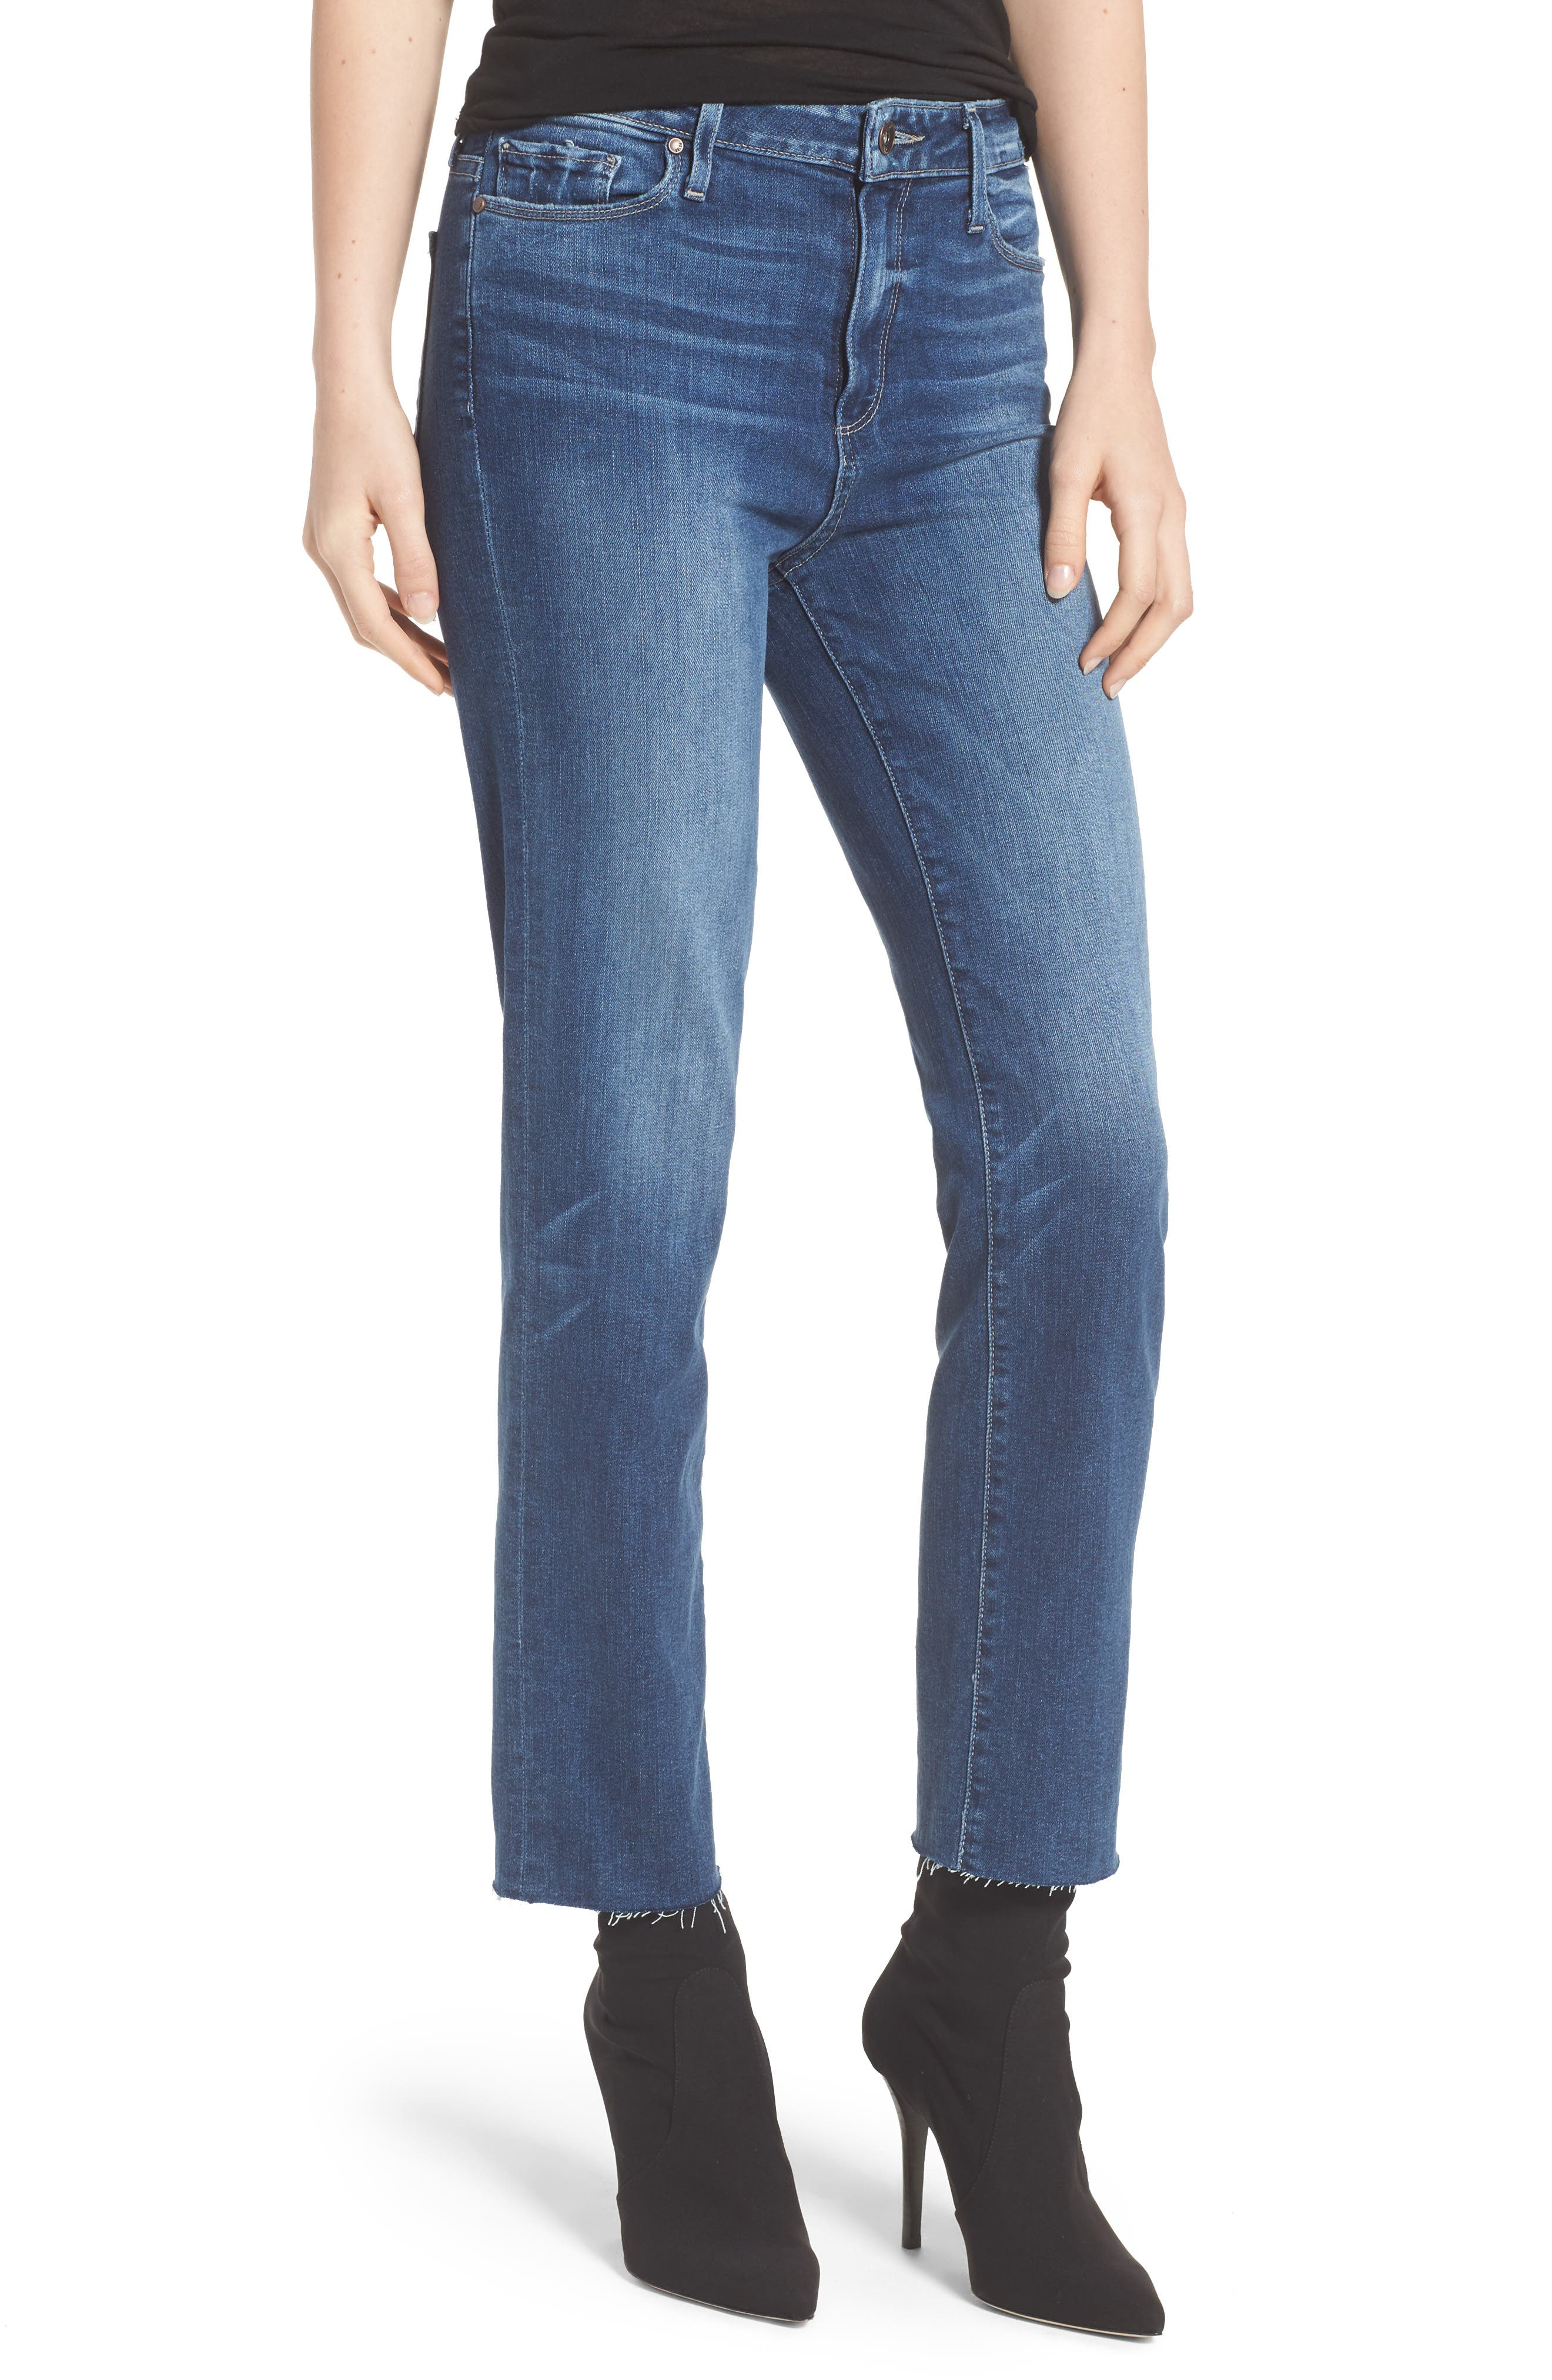 Transcend - Hoxton Ankle Straight Leg Jeans,                             Main thumbnail 1, color,                             Malibu